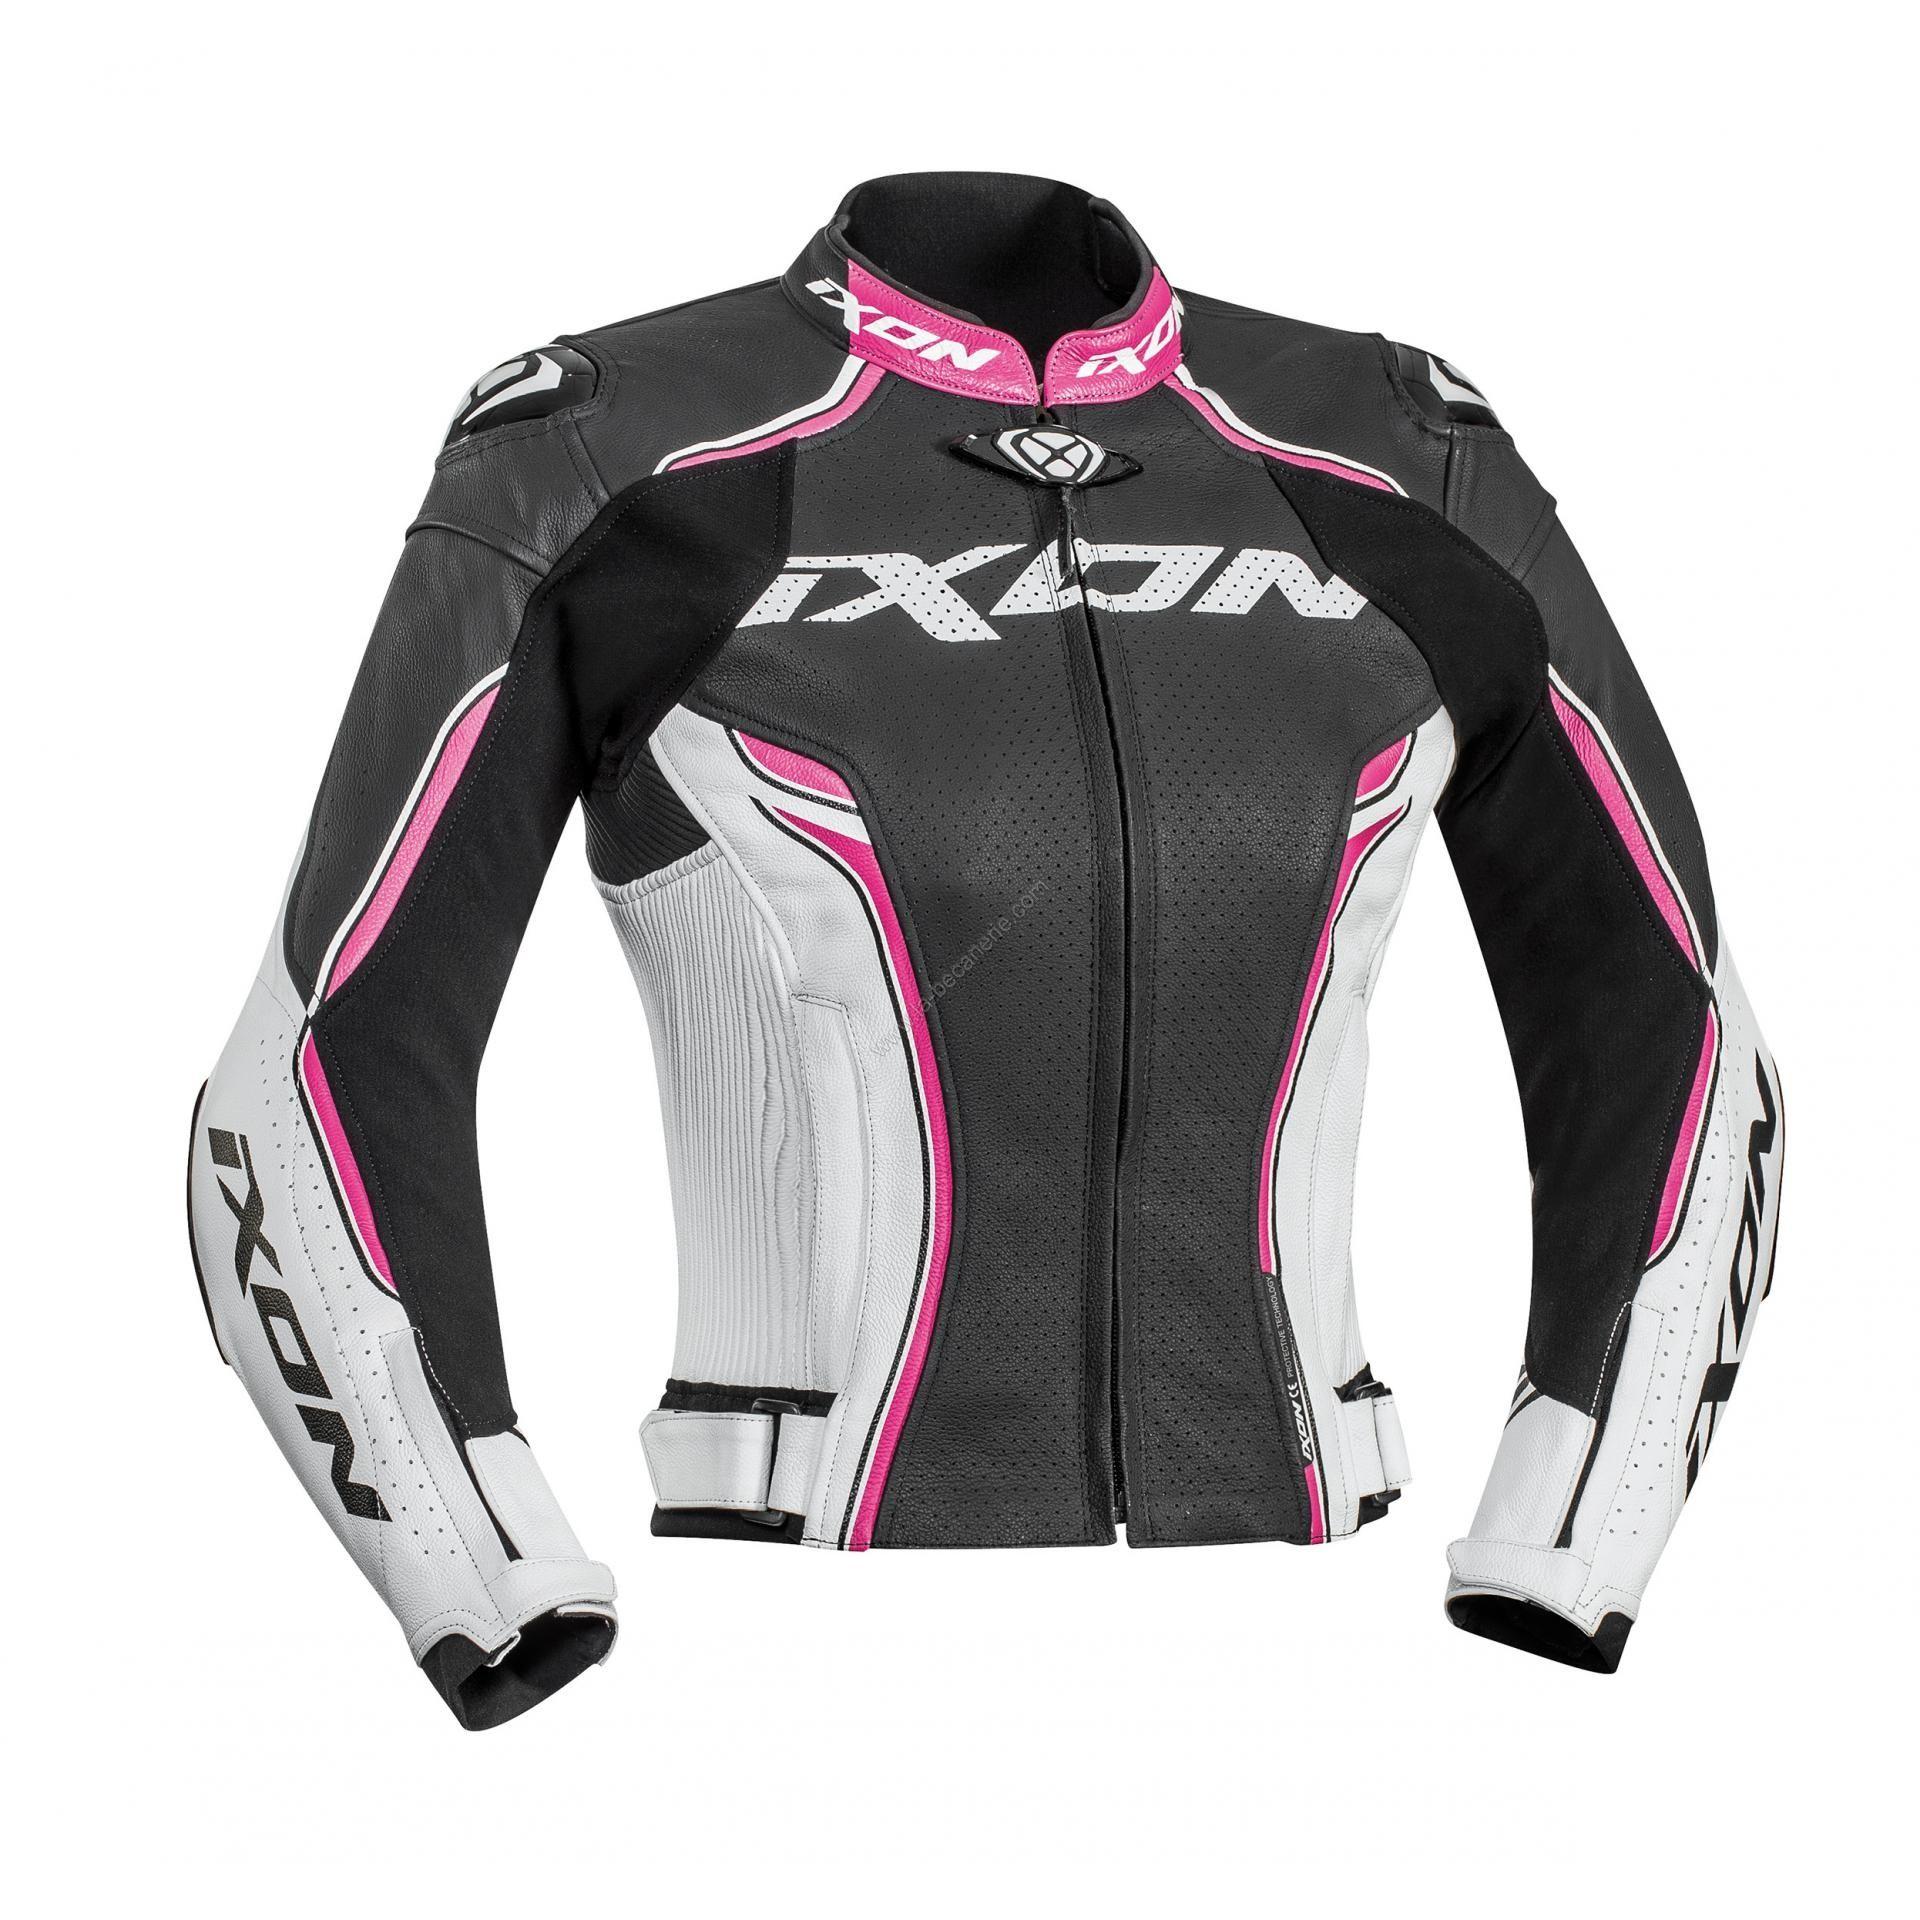 innovative design 04e54 14342 blouson-cuir-femme-ixon-vortex-lady.jpg